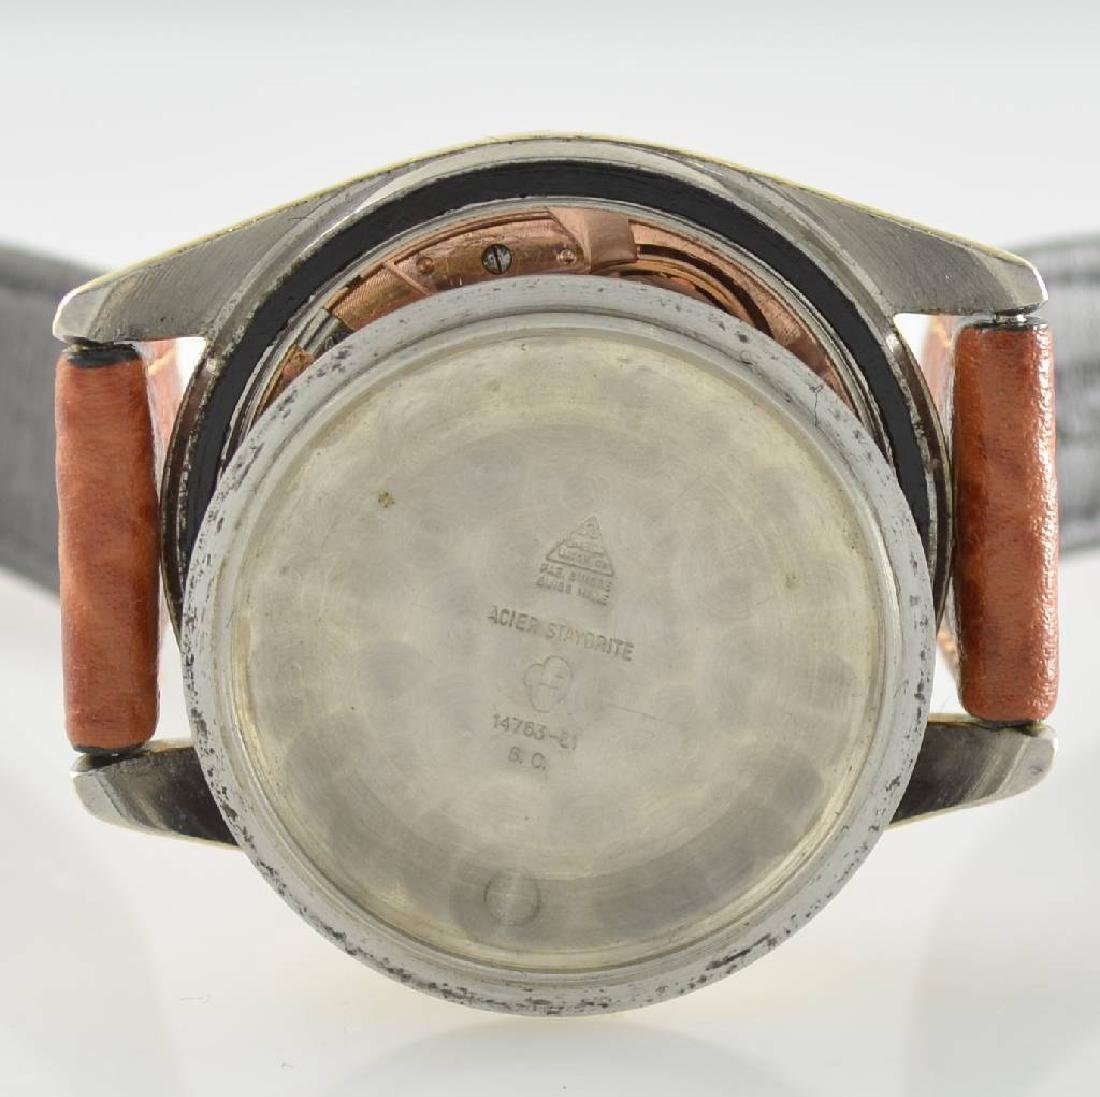 OMEGA self winding gents wristwatch model Seamaster - 6